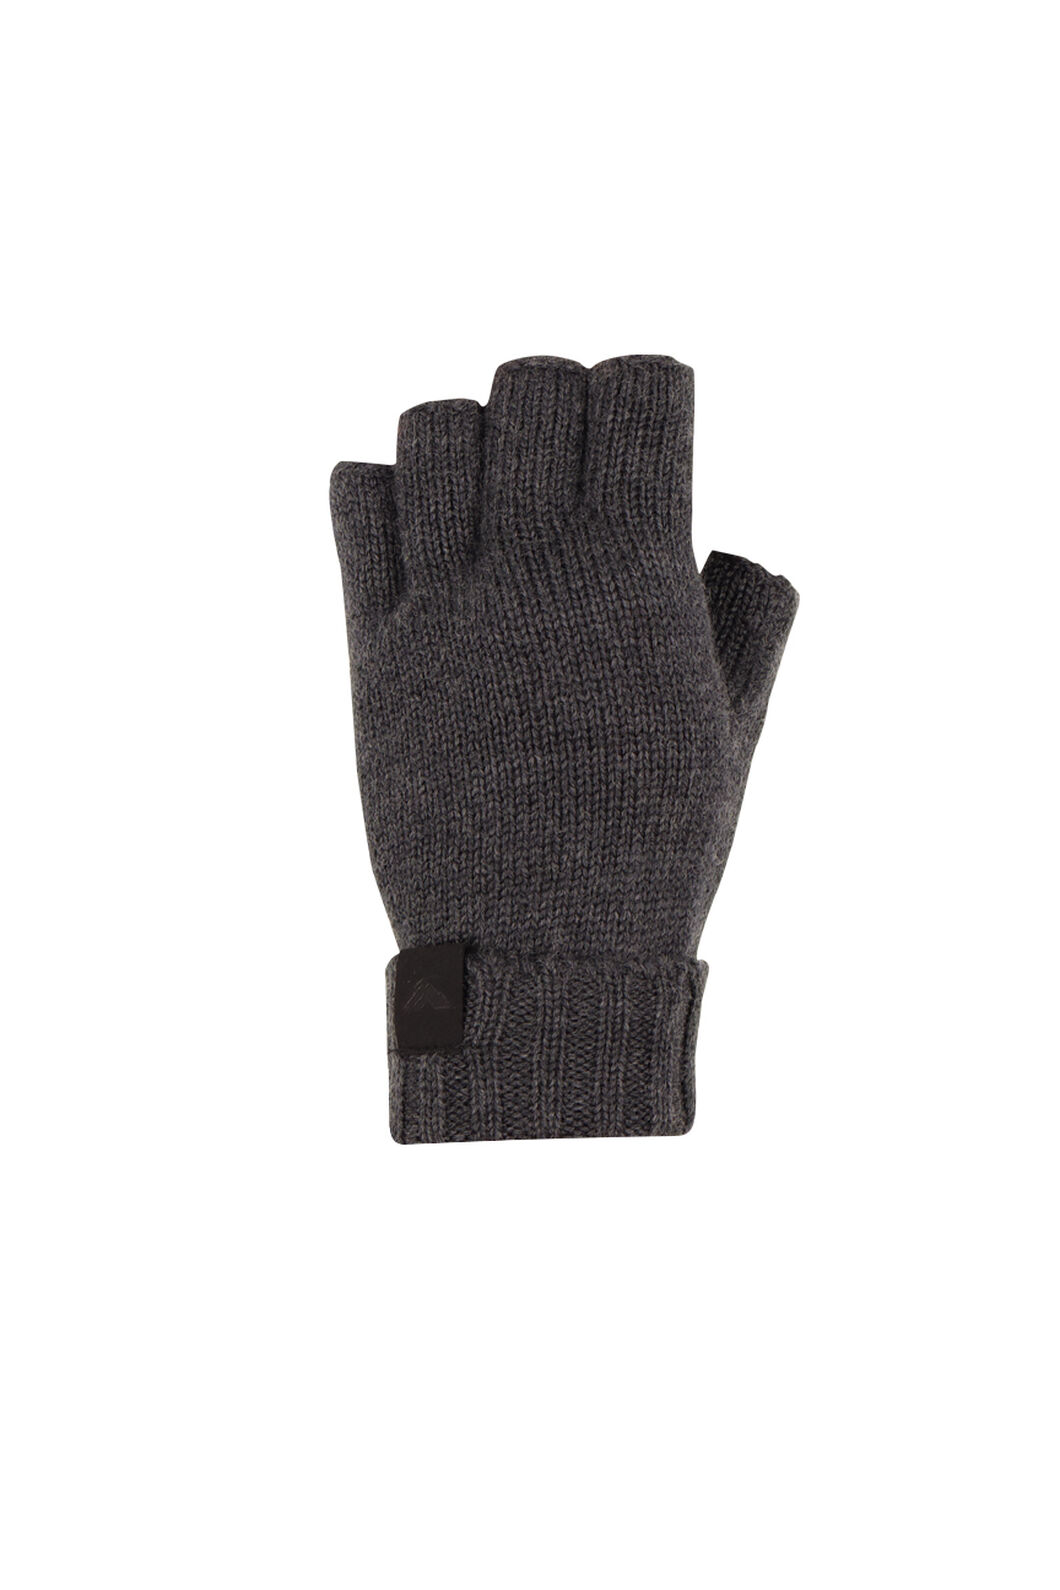 Macpac Merino Fingerless Gloves, Charcoal Melange, hi-res